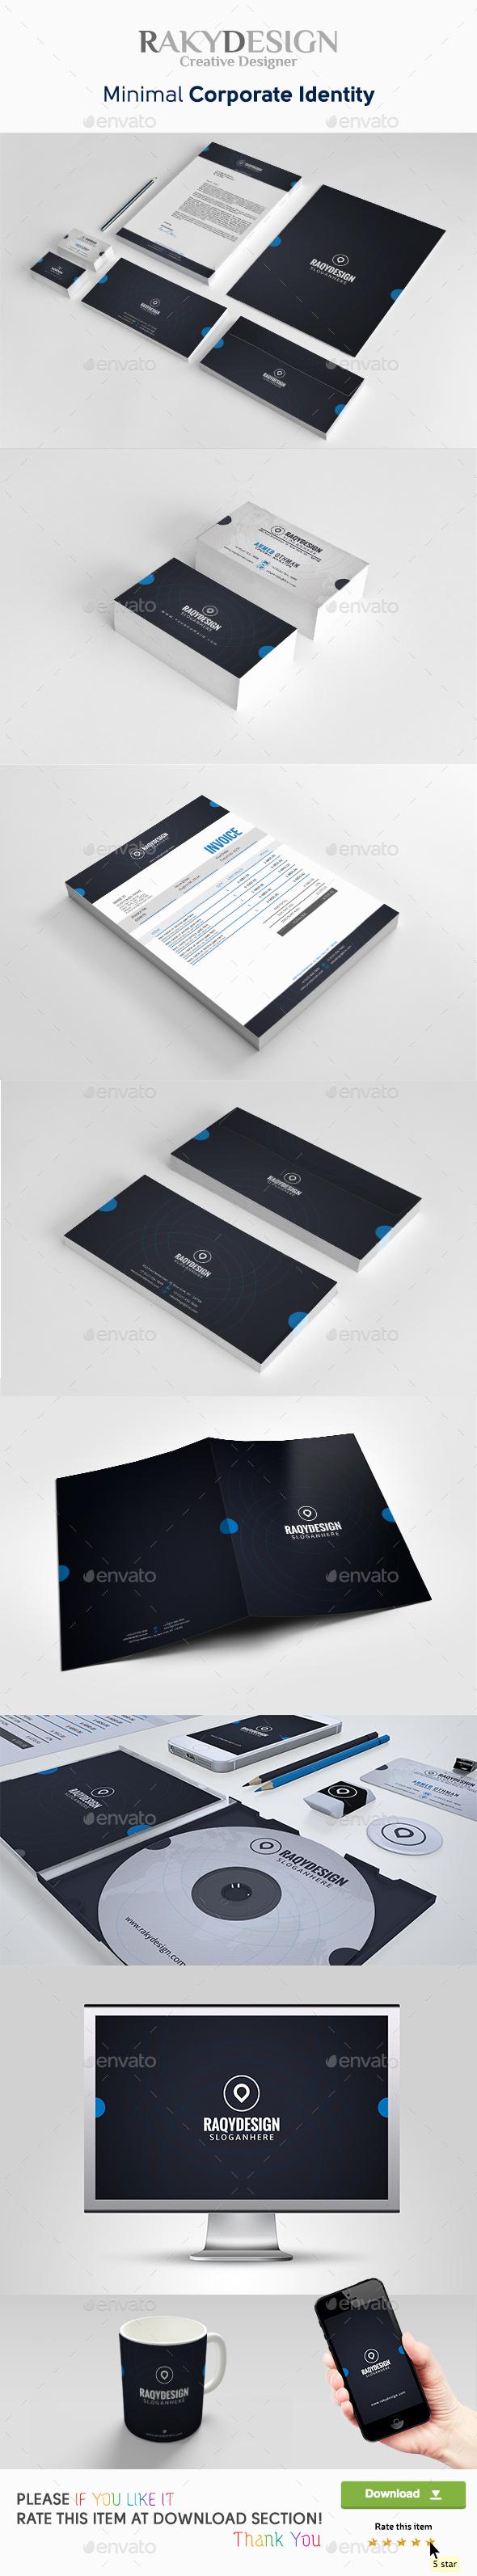 Minimal Corporate Identity - Stationery Print Templates